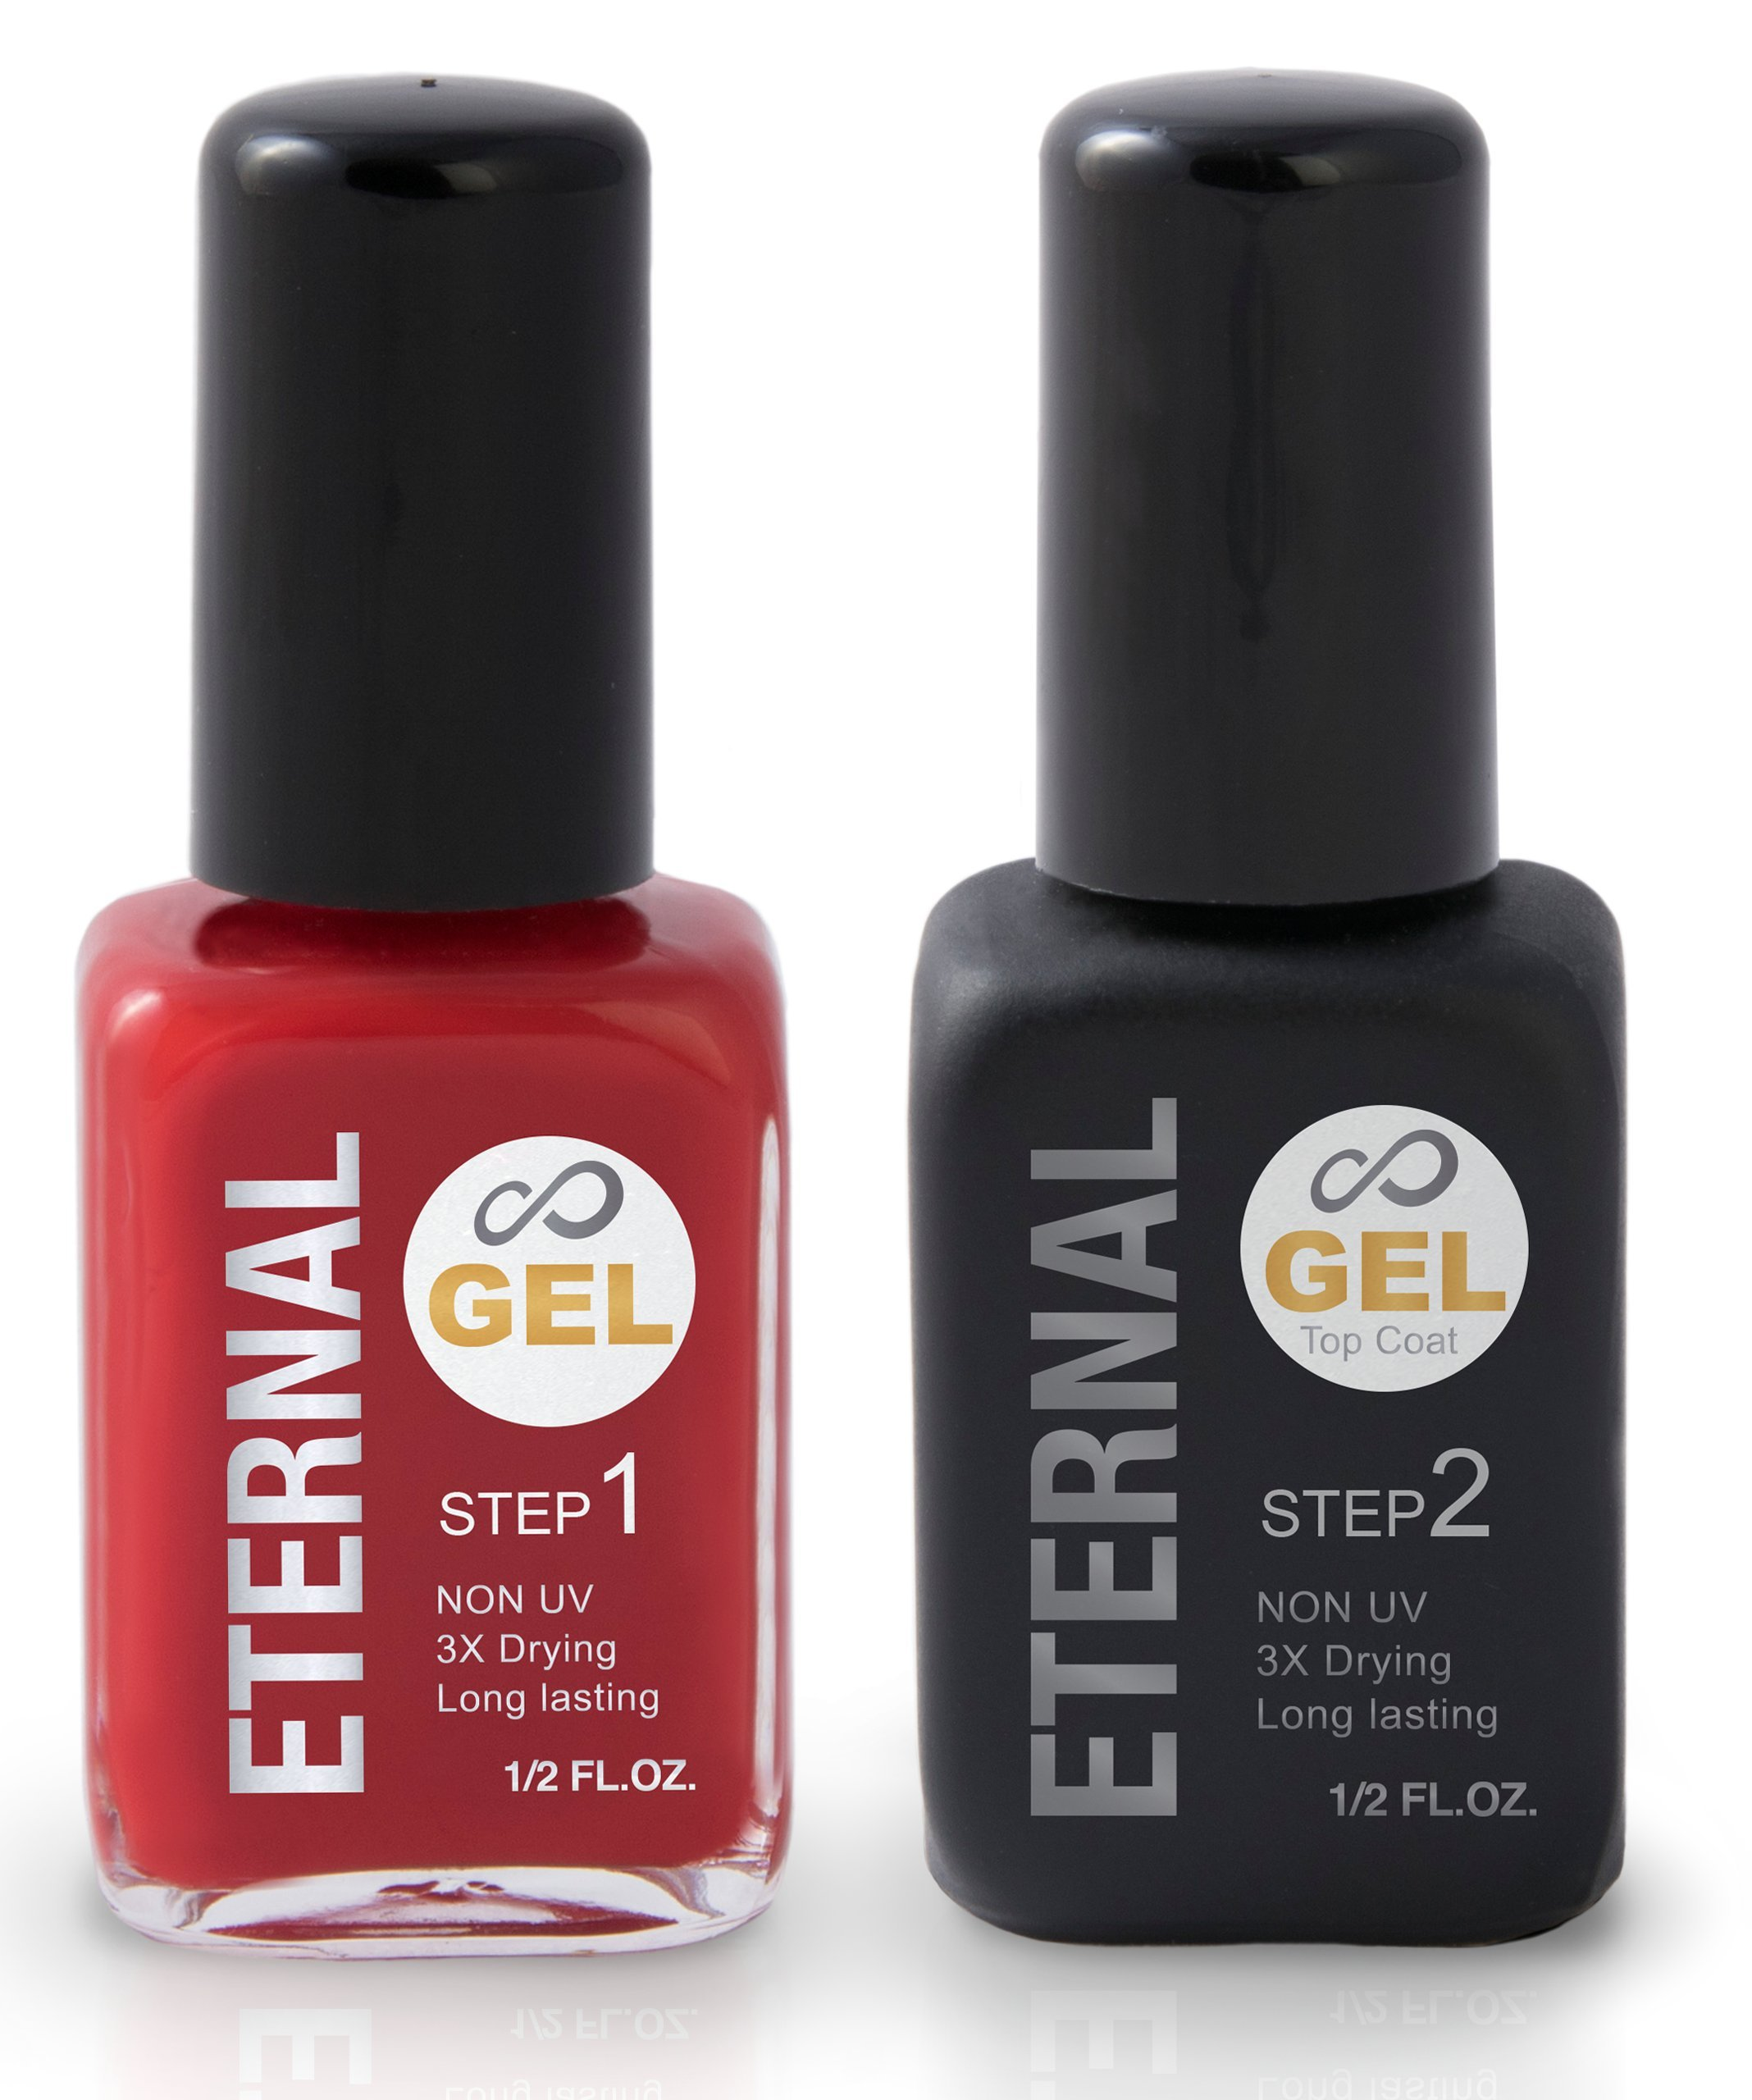 Amazon.com: Eternal Color Gel Nail Enamel Nude + Gel Top Coat ...